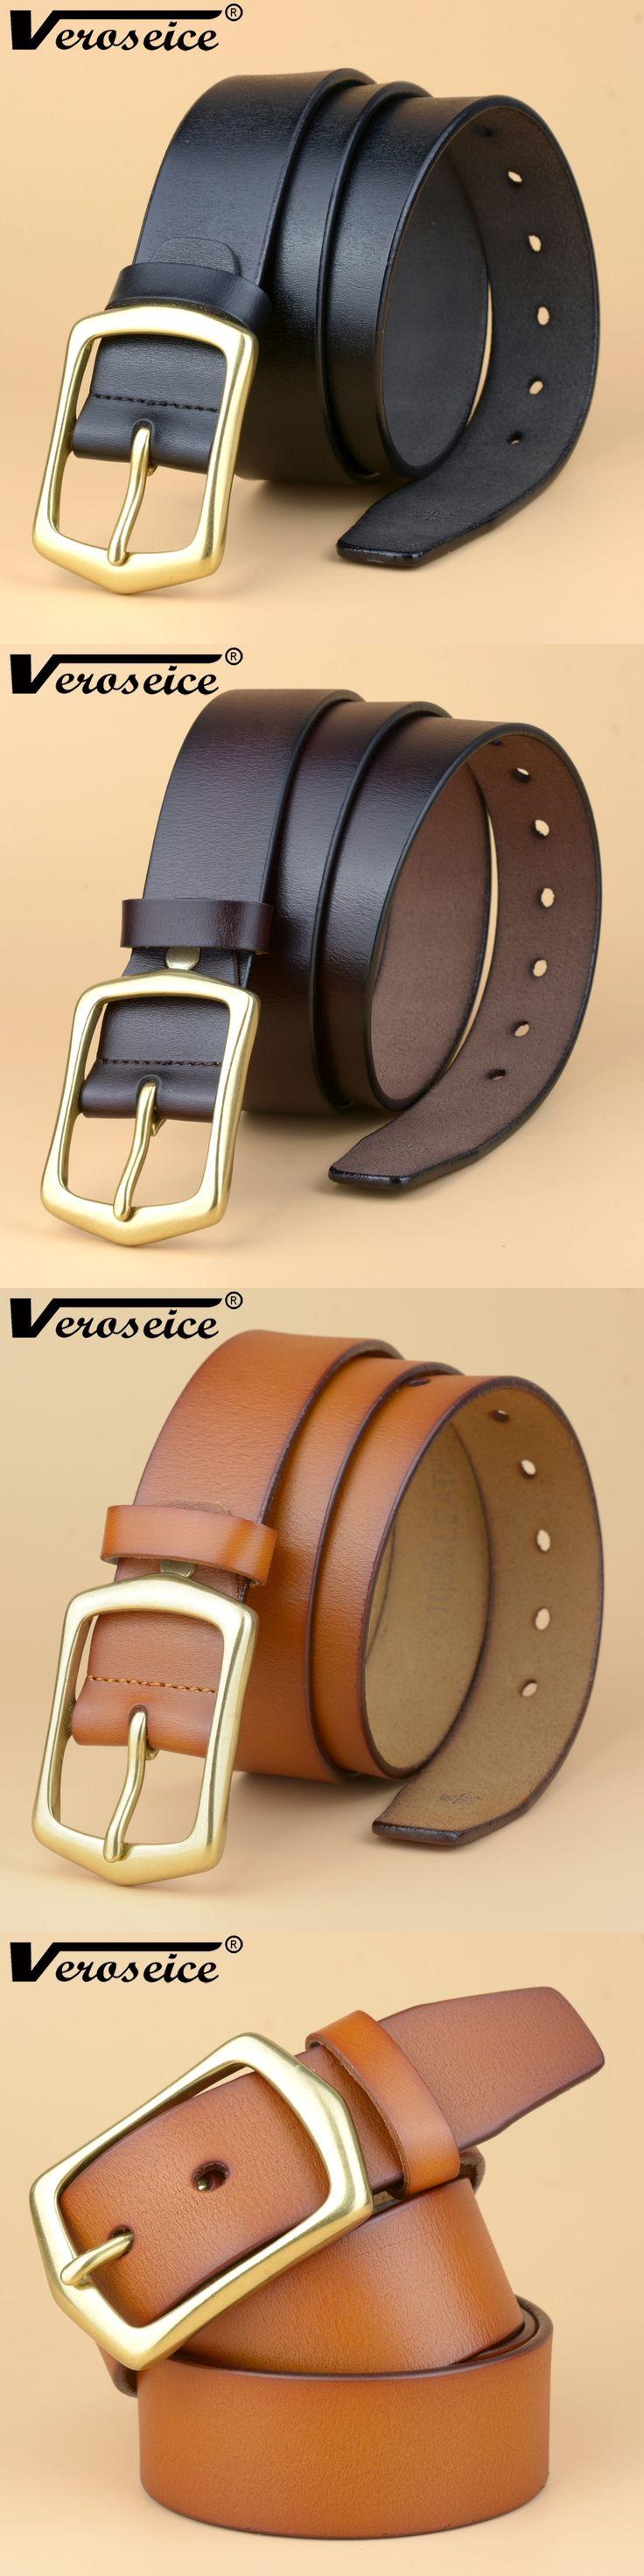 [TG] New genuine Leather Good Quality business mens belt luxury Designer Brass Buckle Male Belts For Men Jeans cowboy belts